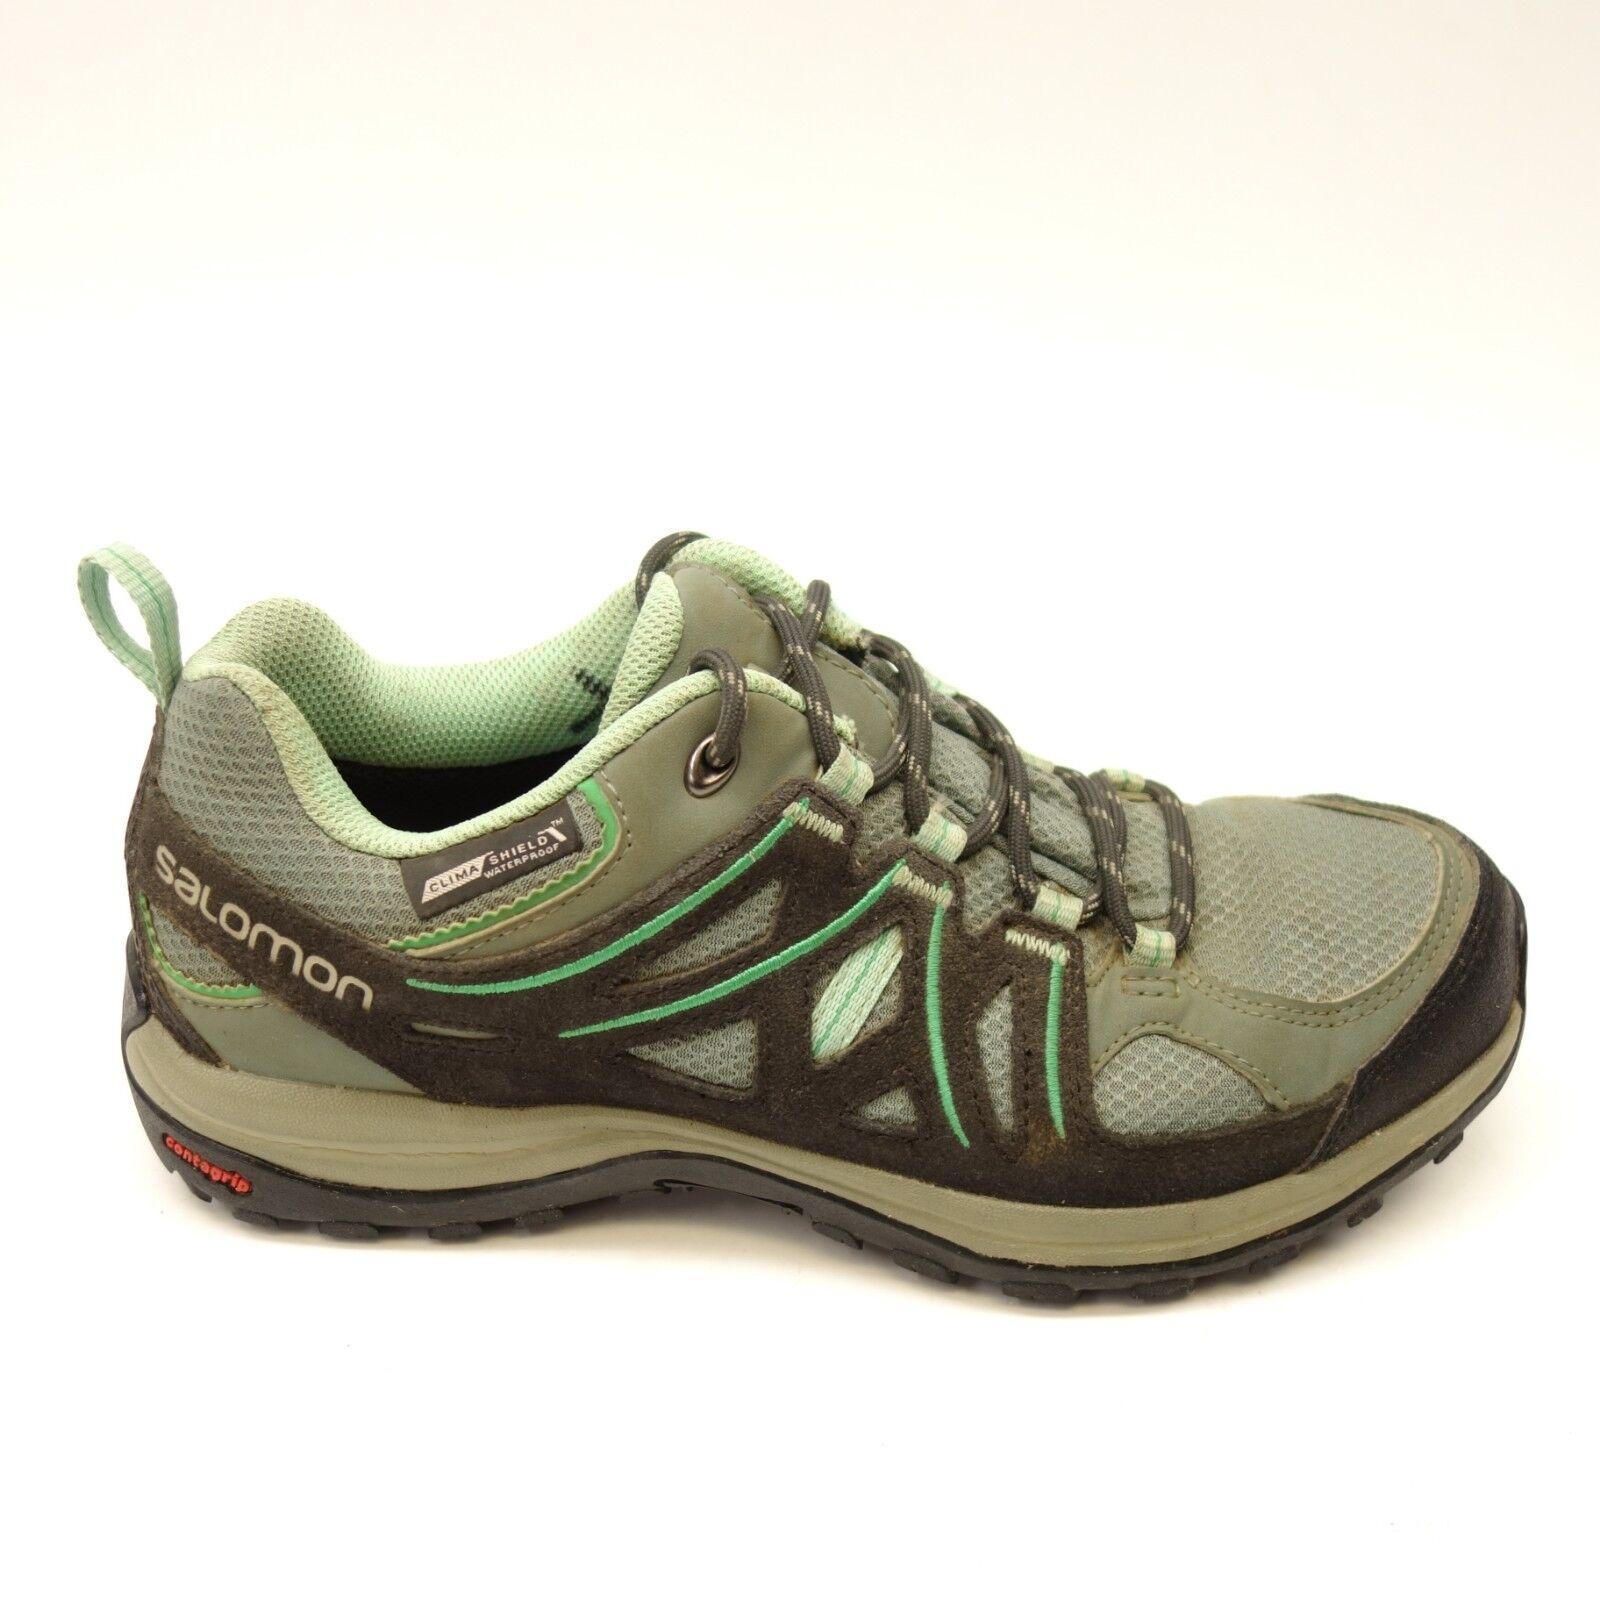 Salomon Womens Ellipse 2 CS WP Terrain Athletic Hiking Trail shoes Size US 6